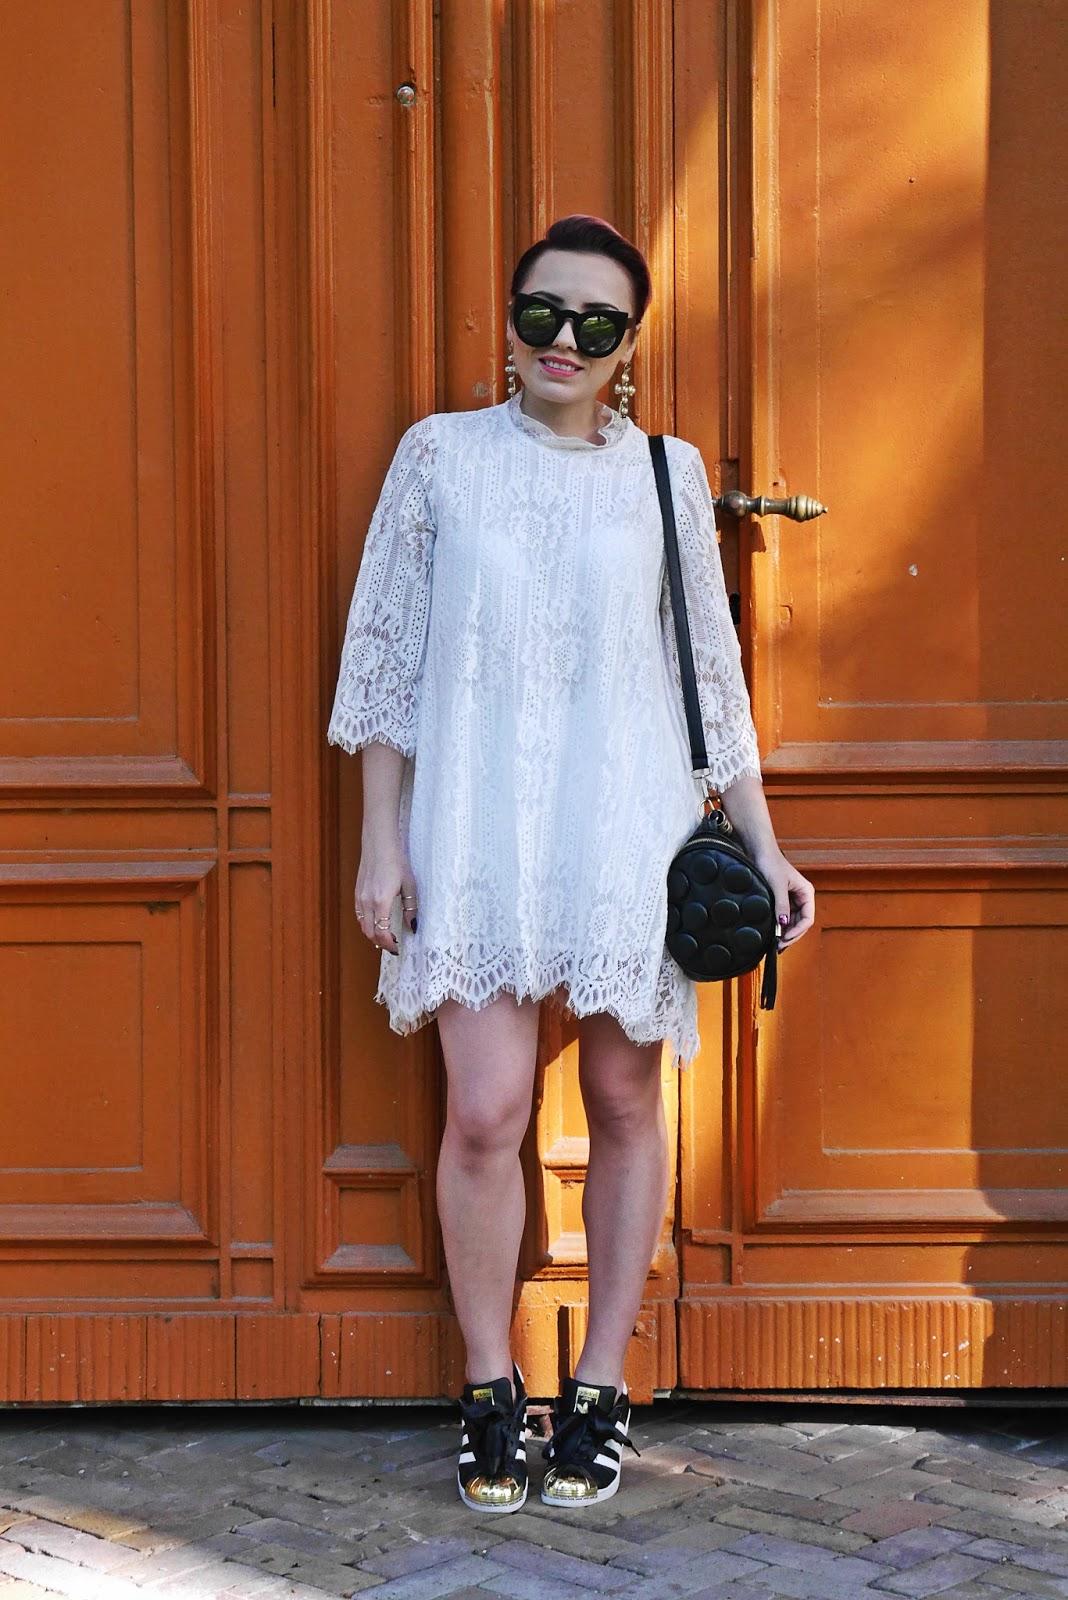 biala_sukienka_koronkowa_superstary_czarne_karyn_blog_250517a